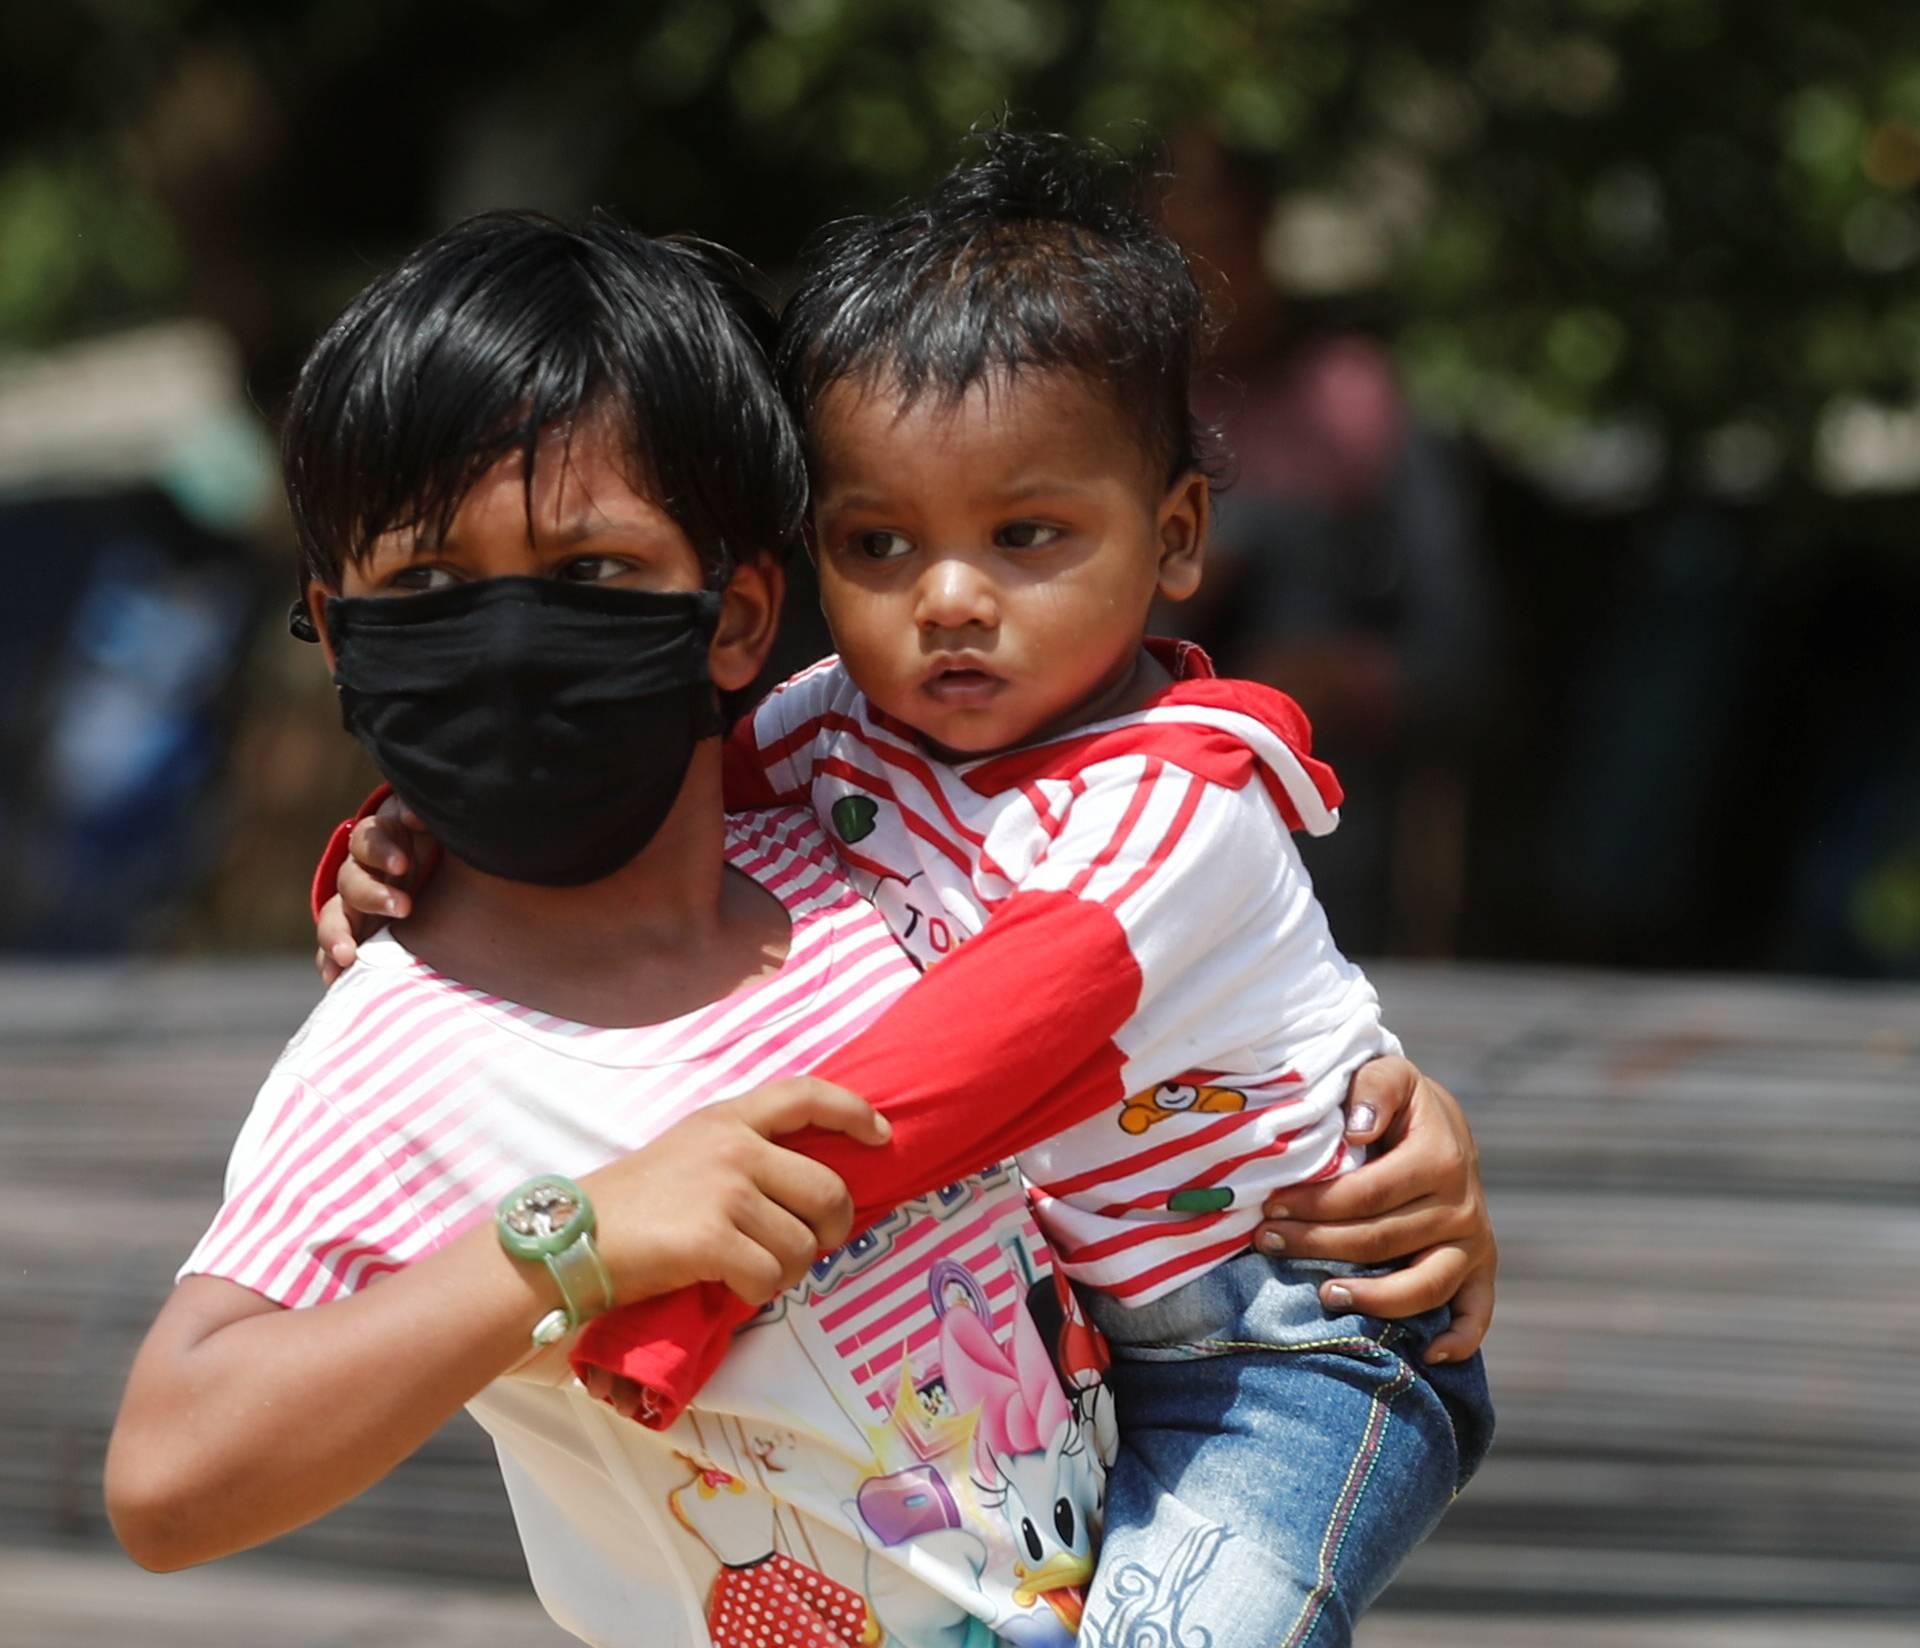 The spread of the coronavirus disease (COVID-19) in Mumbai